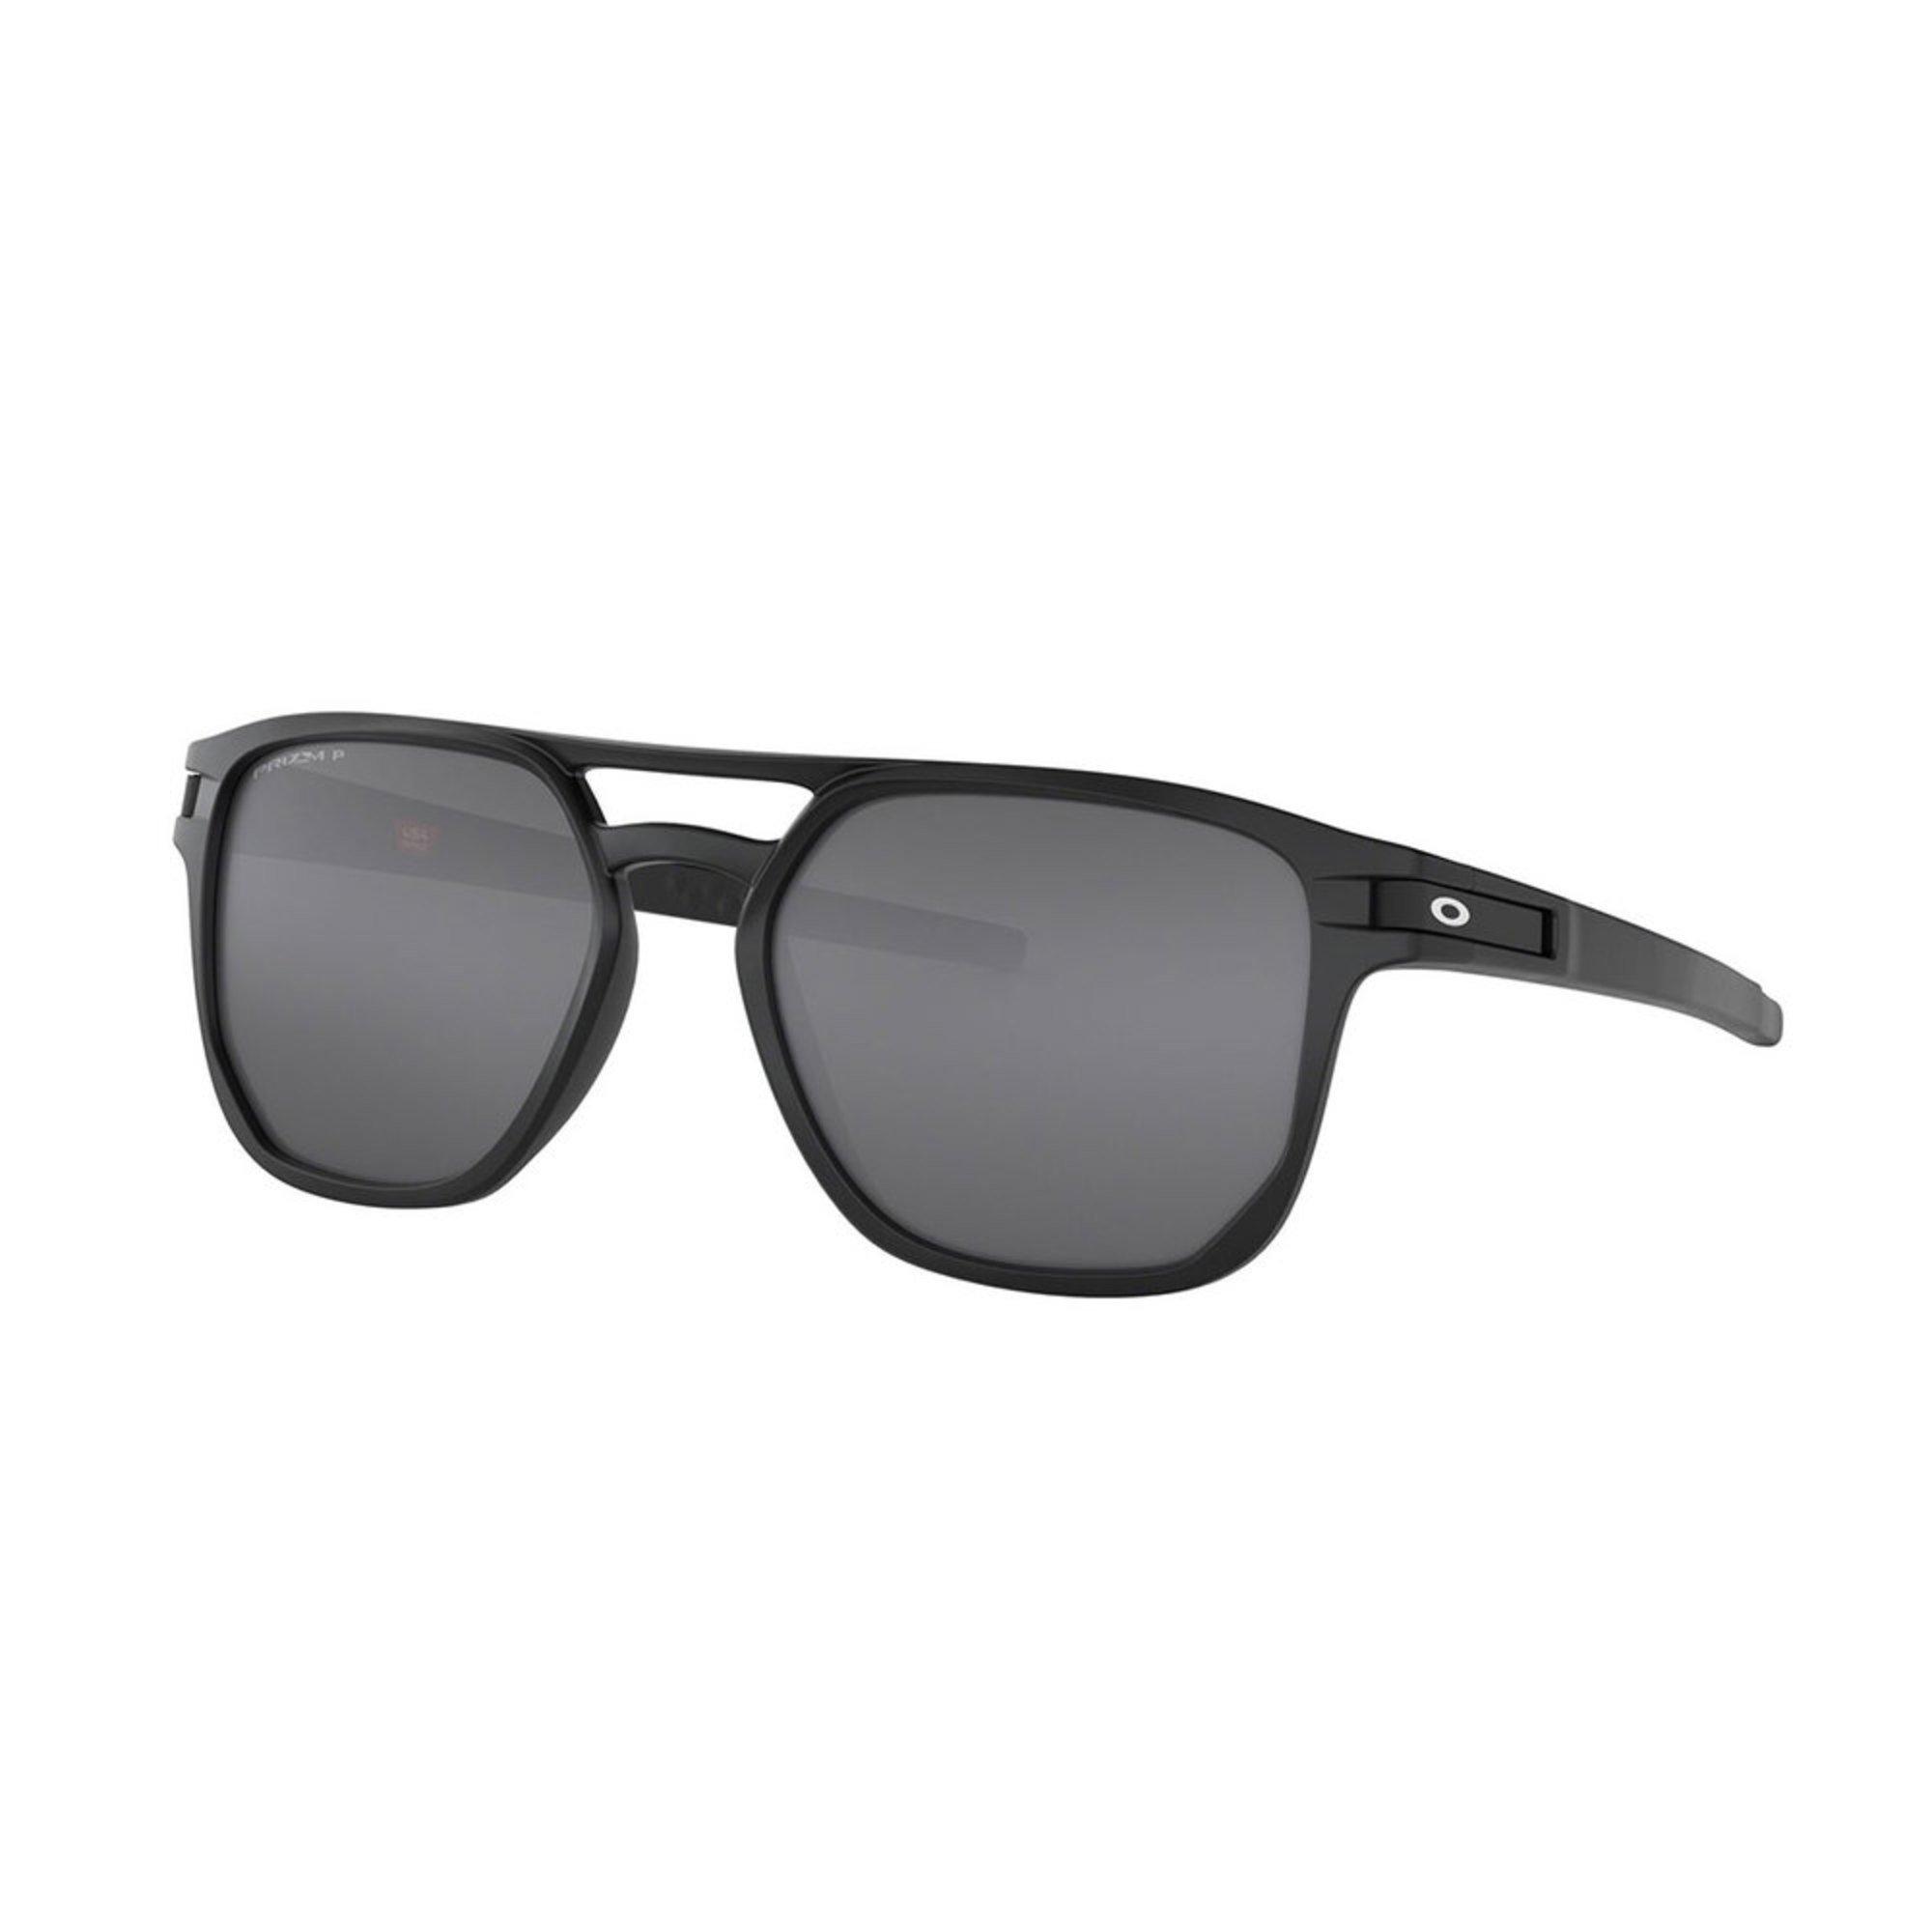 6bb5ed097b Oakley. Oakley Men s Latch Beta Matte Black PRIZM Black Polarized Sunglasses  54mm